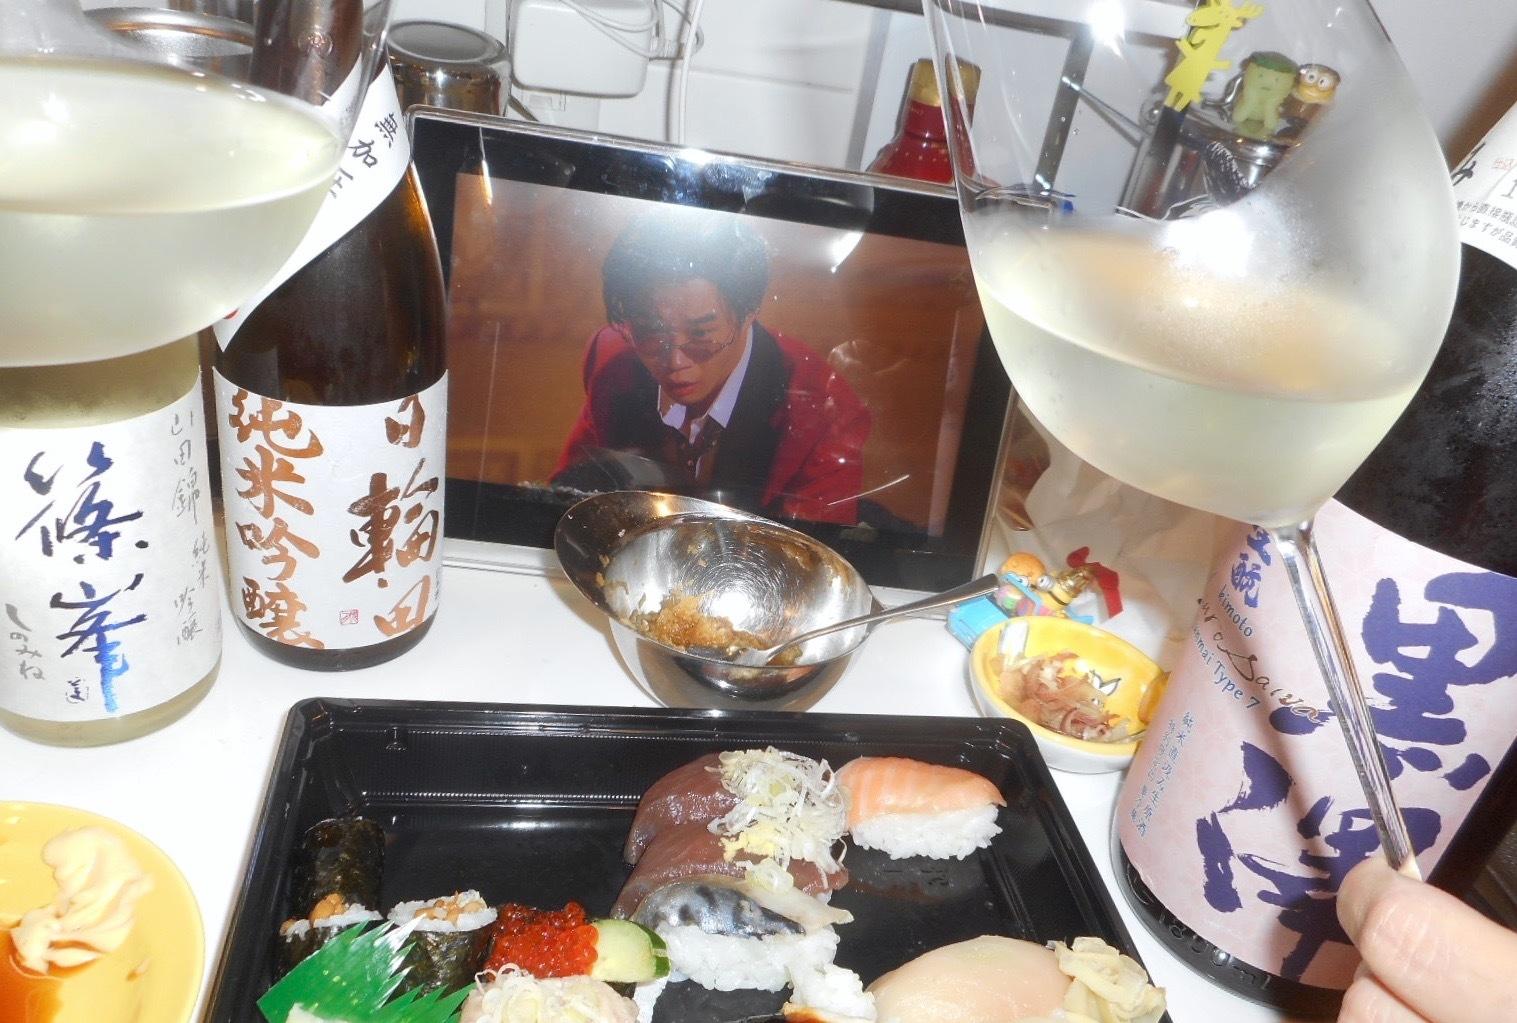 hiwata_mukaatu26by4_5.jpg